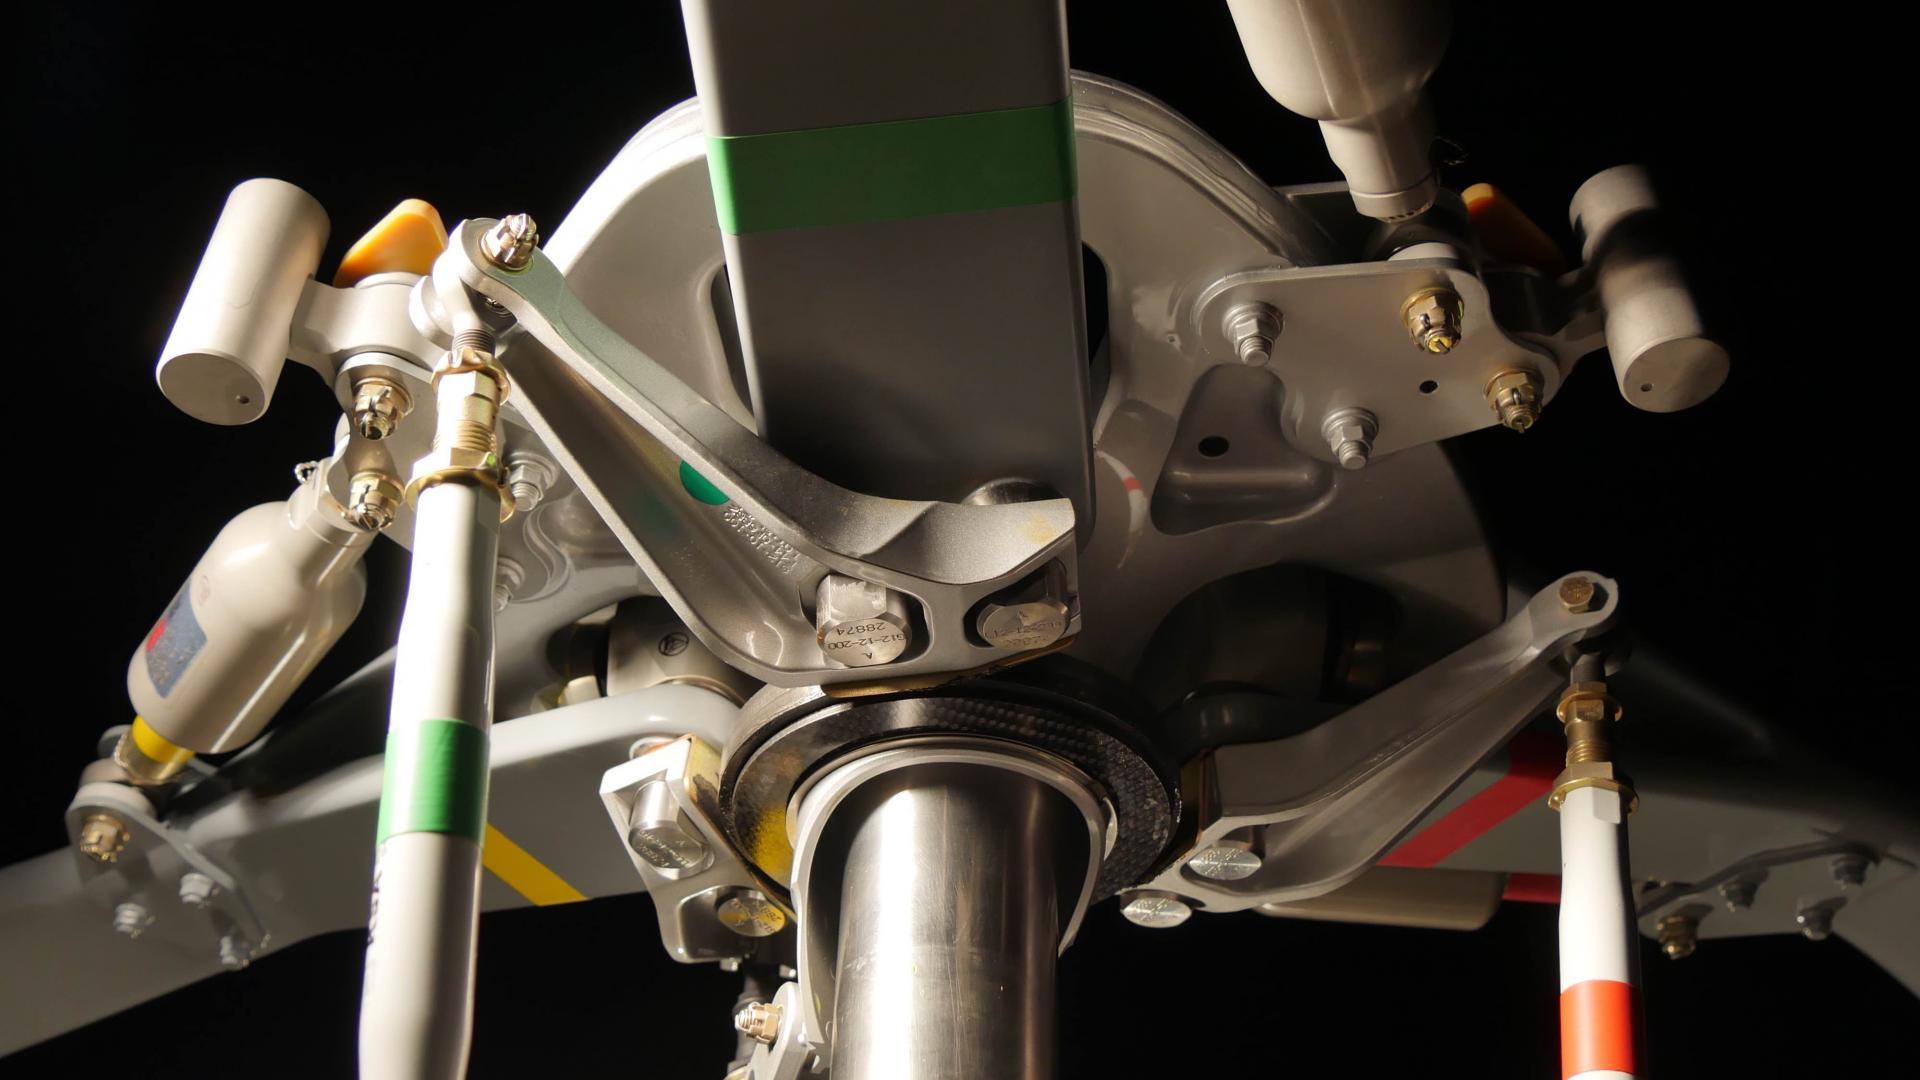 Rotor articulé Sphériflex - Cabri G2